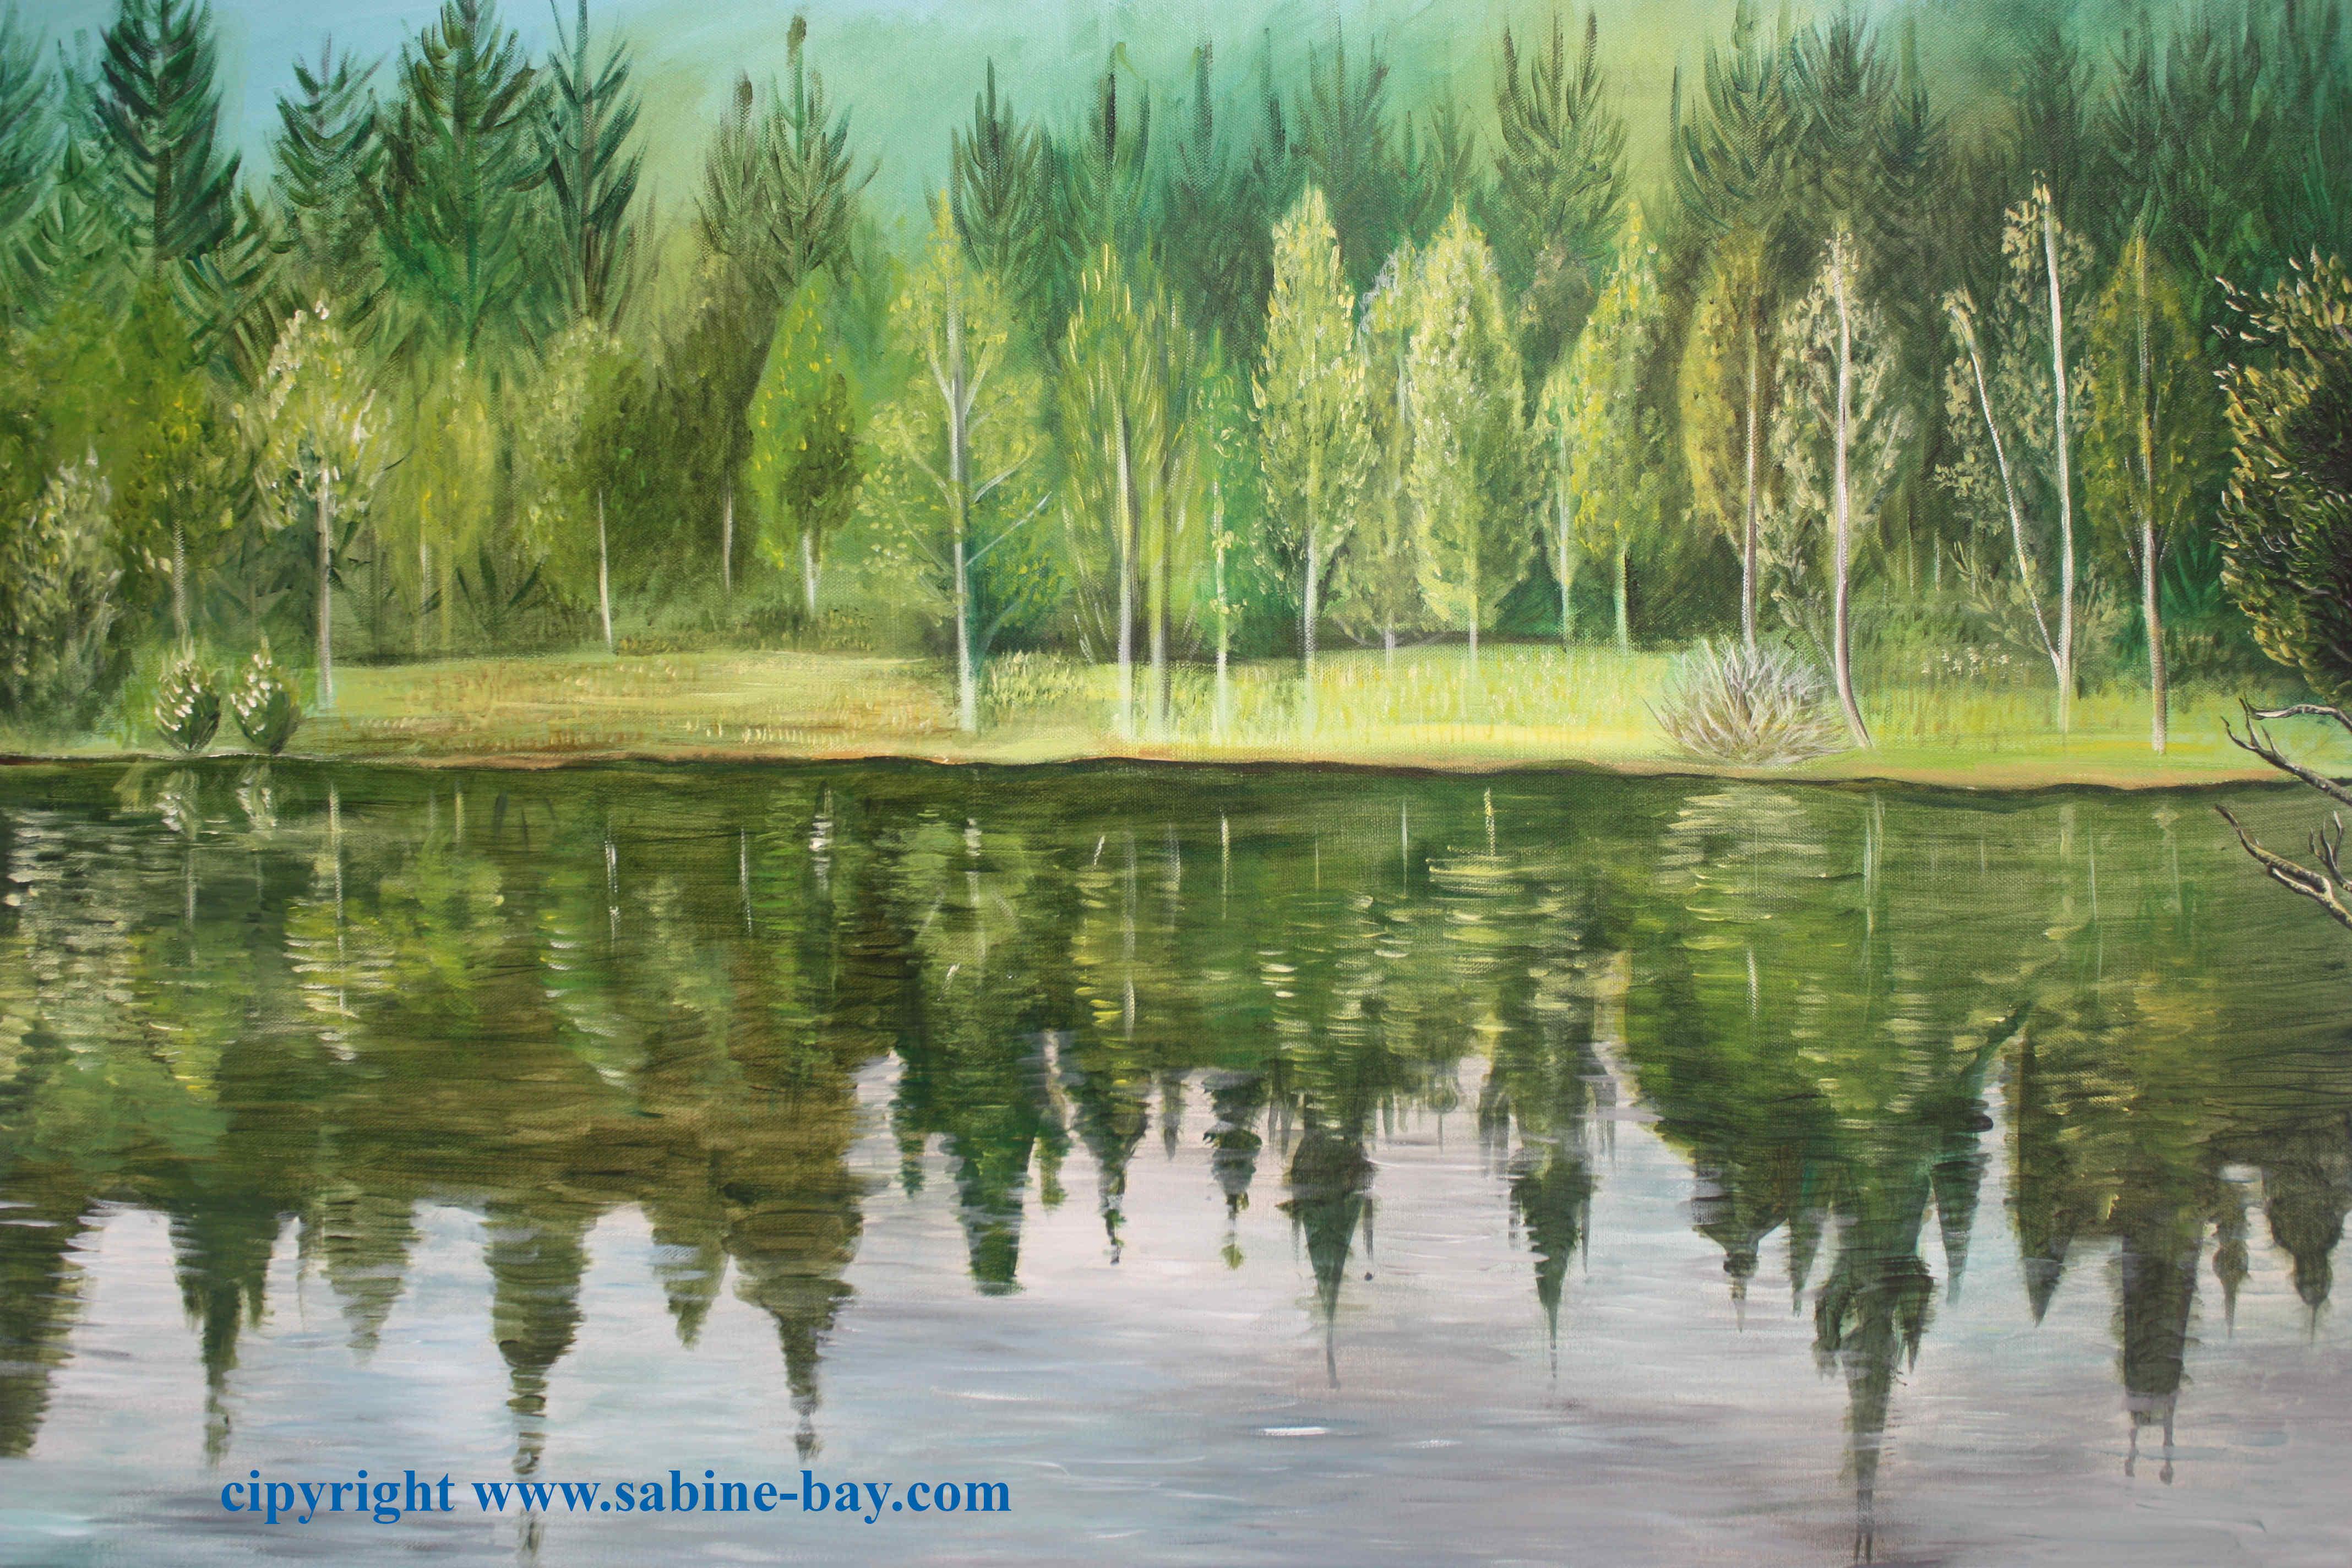 L'ancien lac